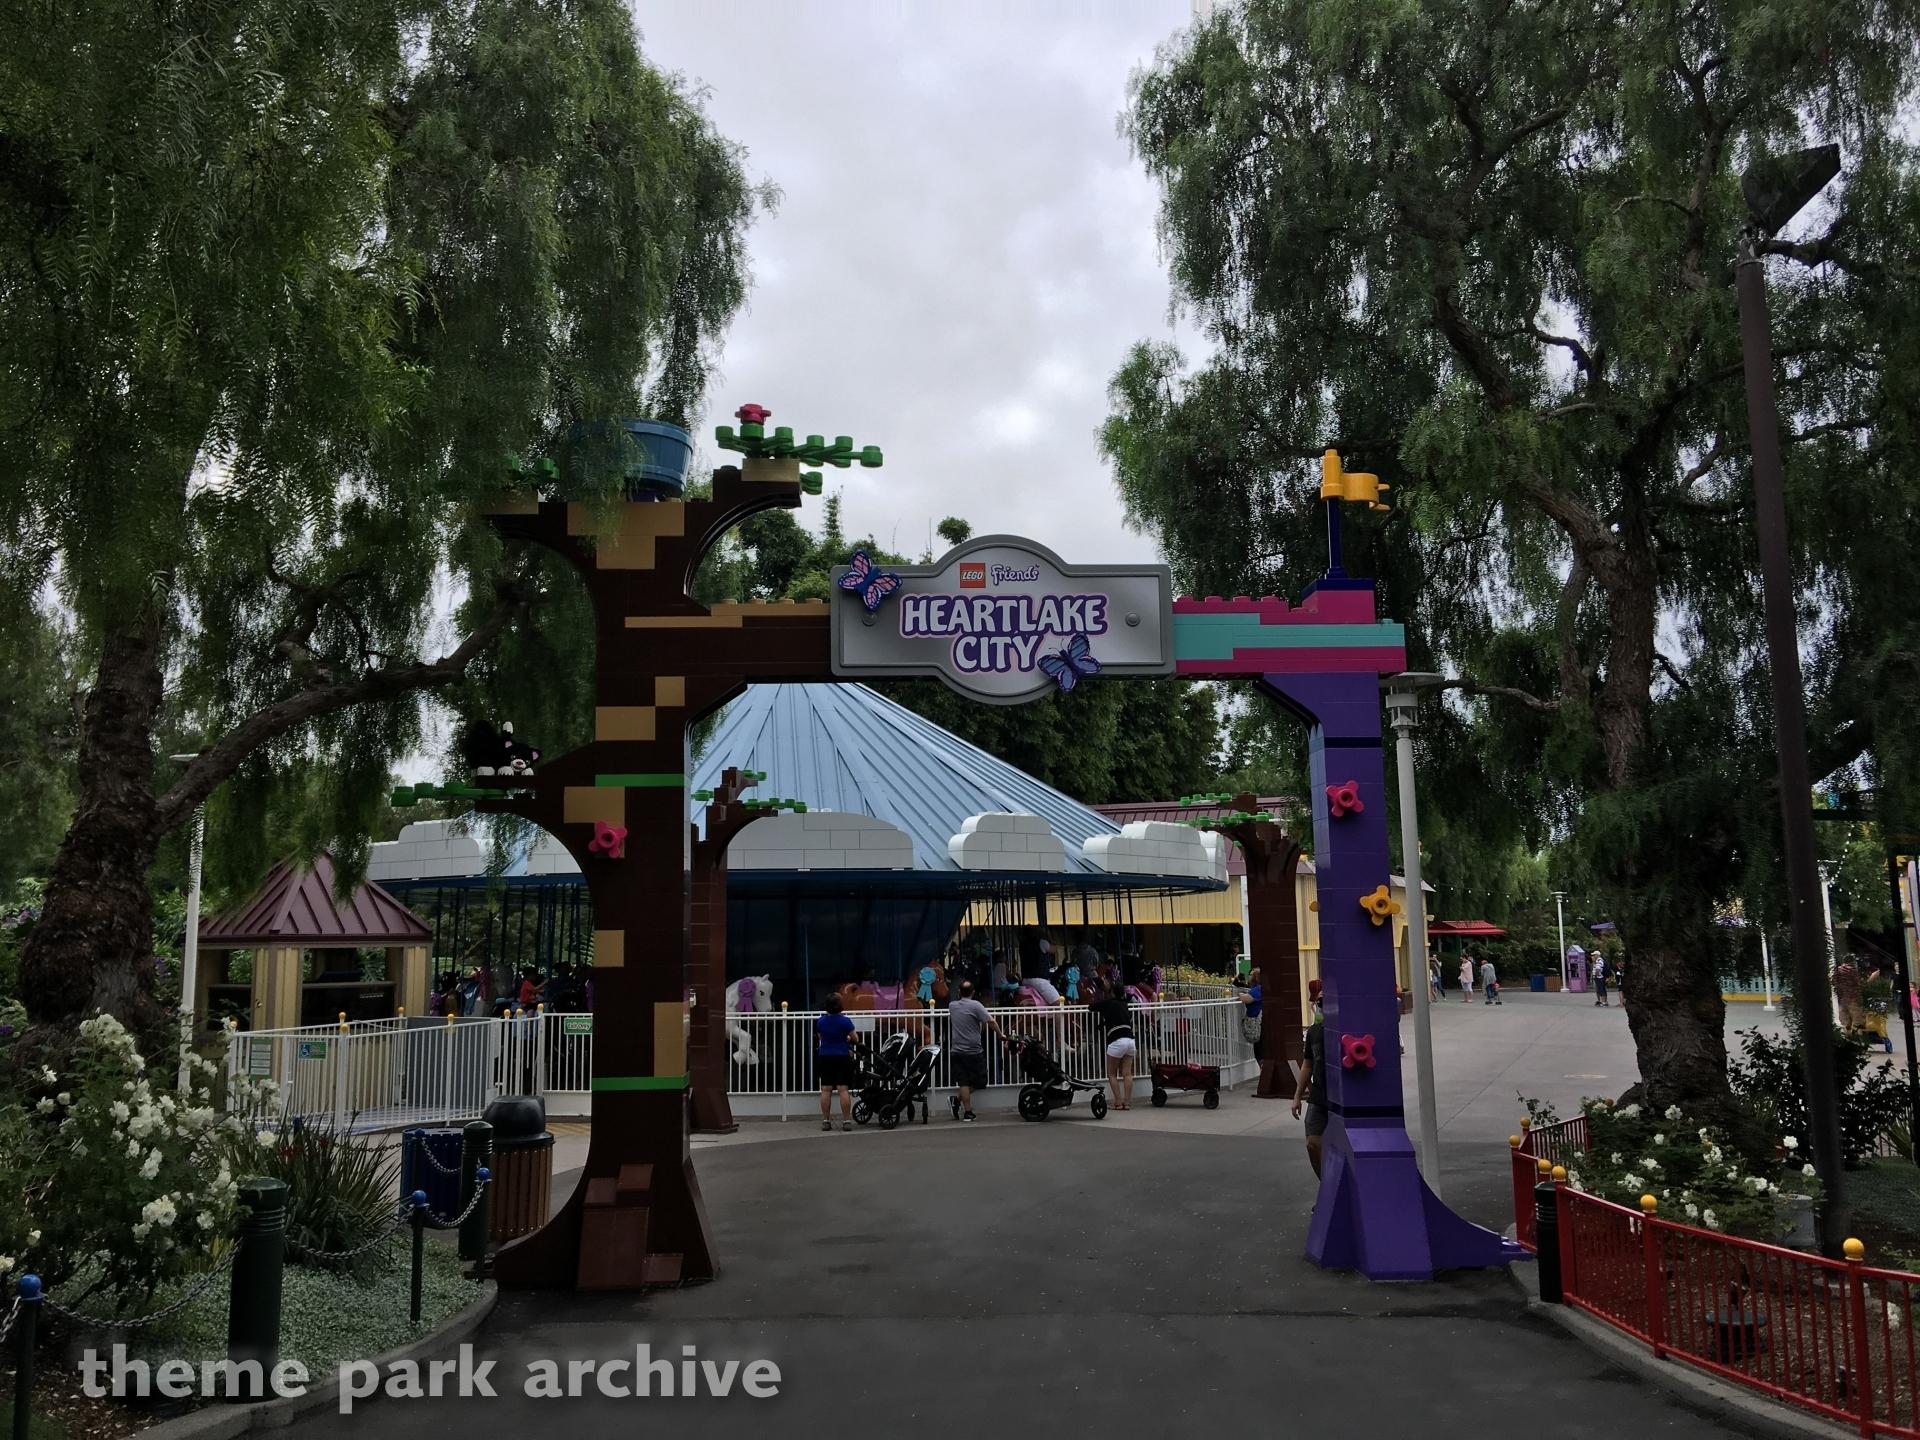 LEGO Friends Heartlake City at LEGOLAND California